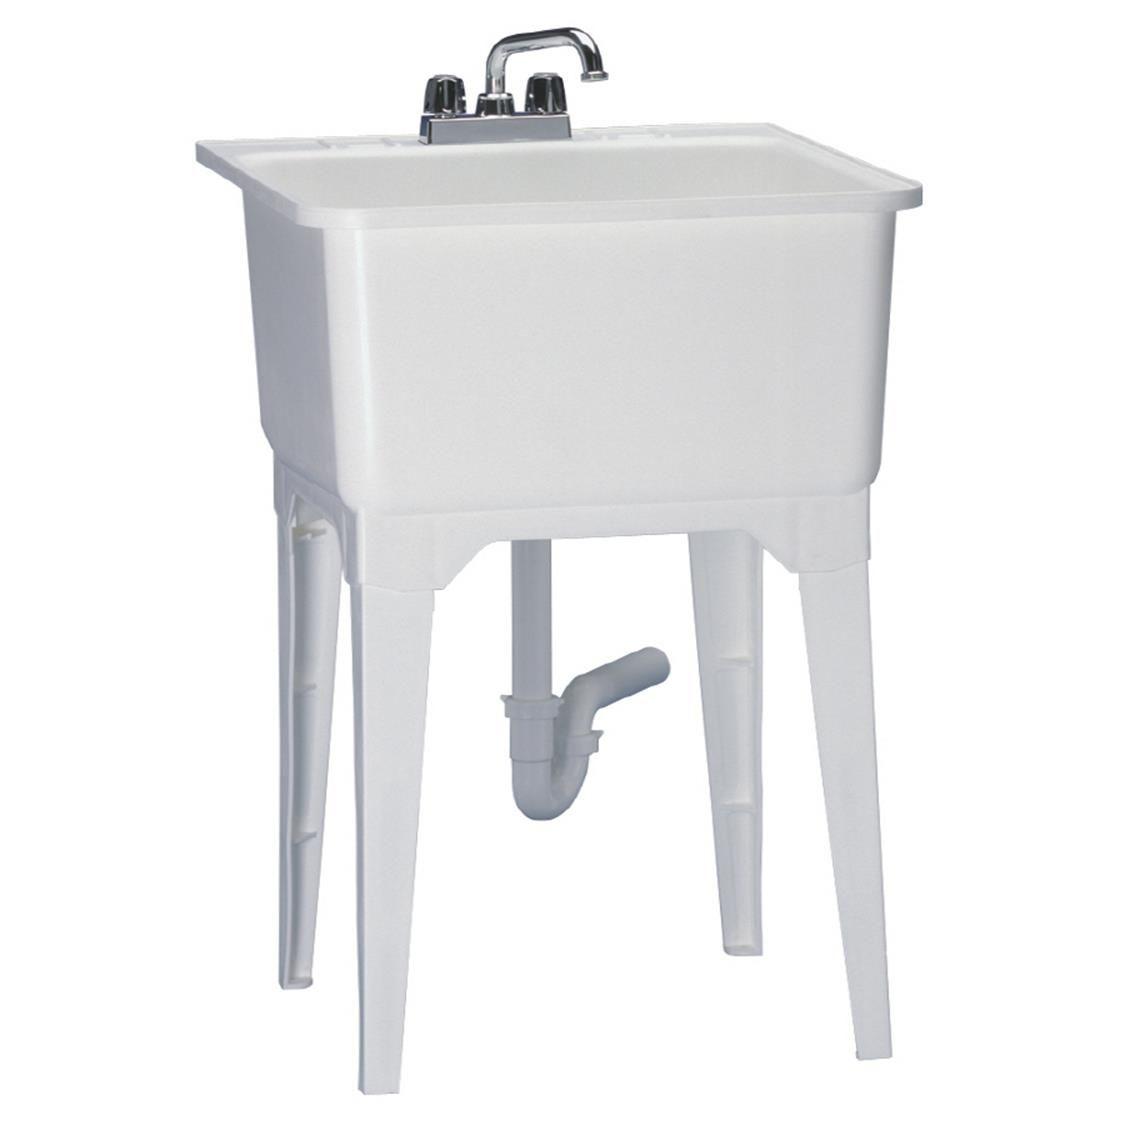 Choose Your Favorite Kitchen And Bar Lowes Sink Design Sink